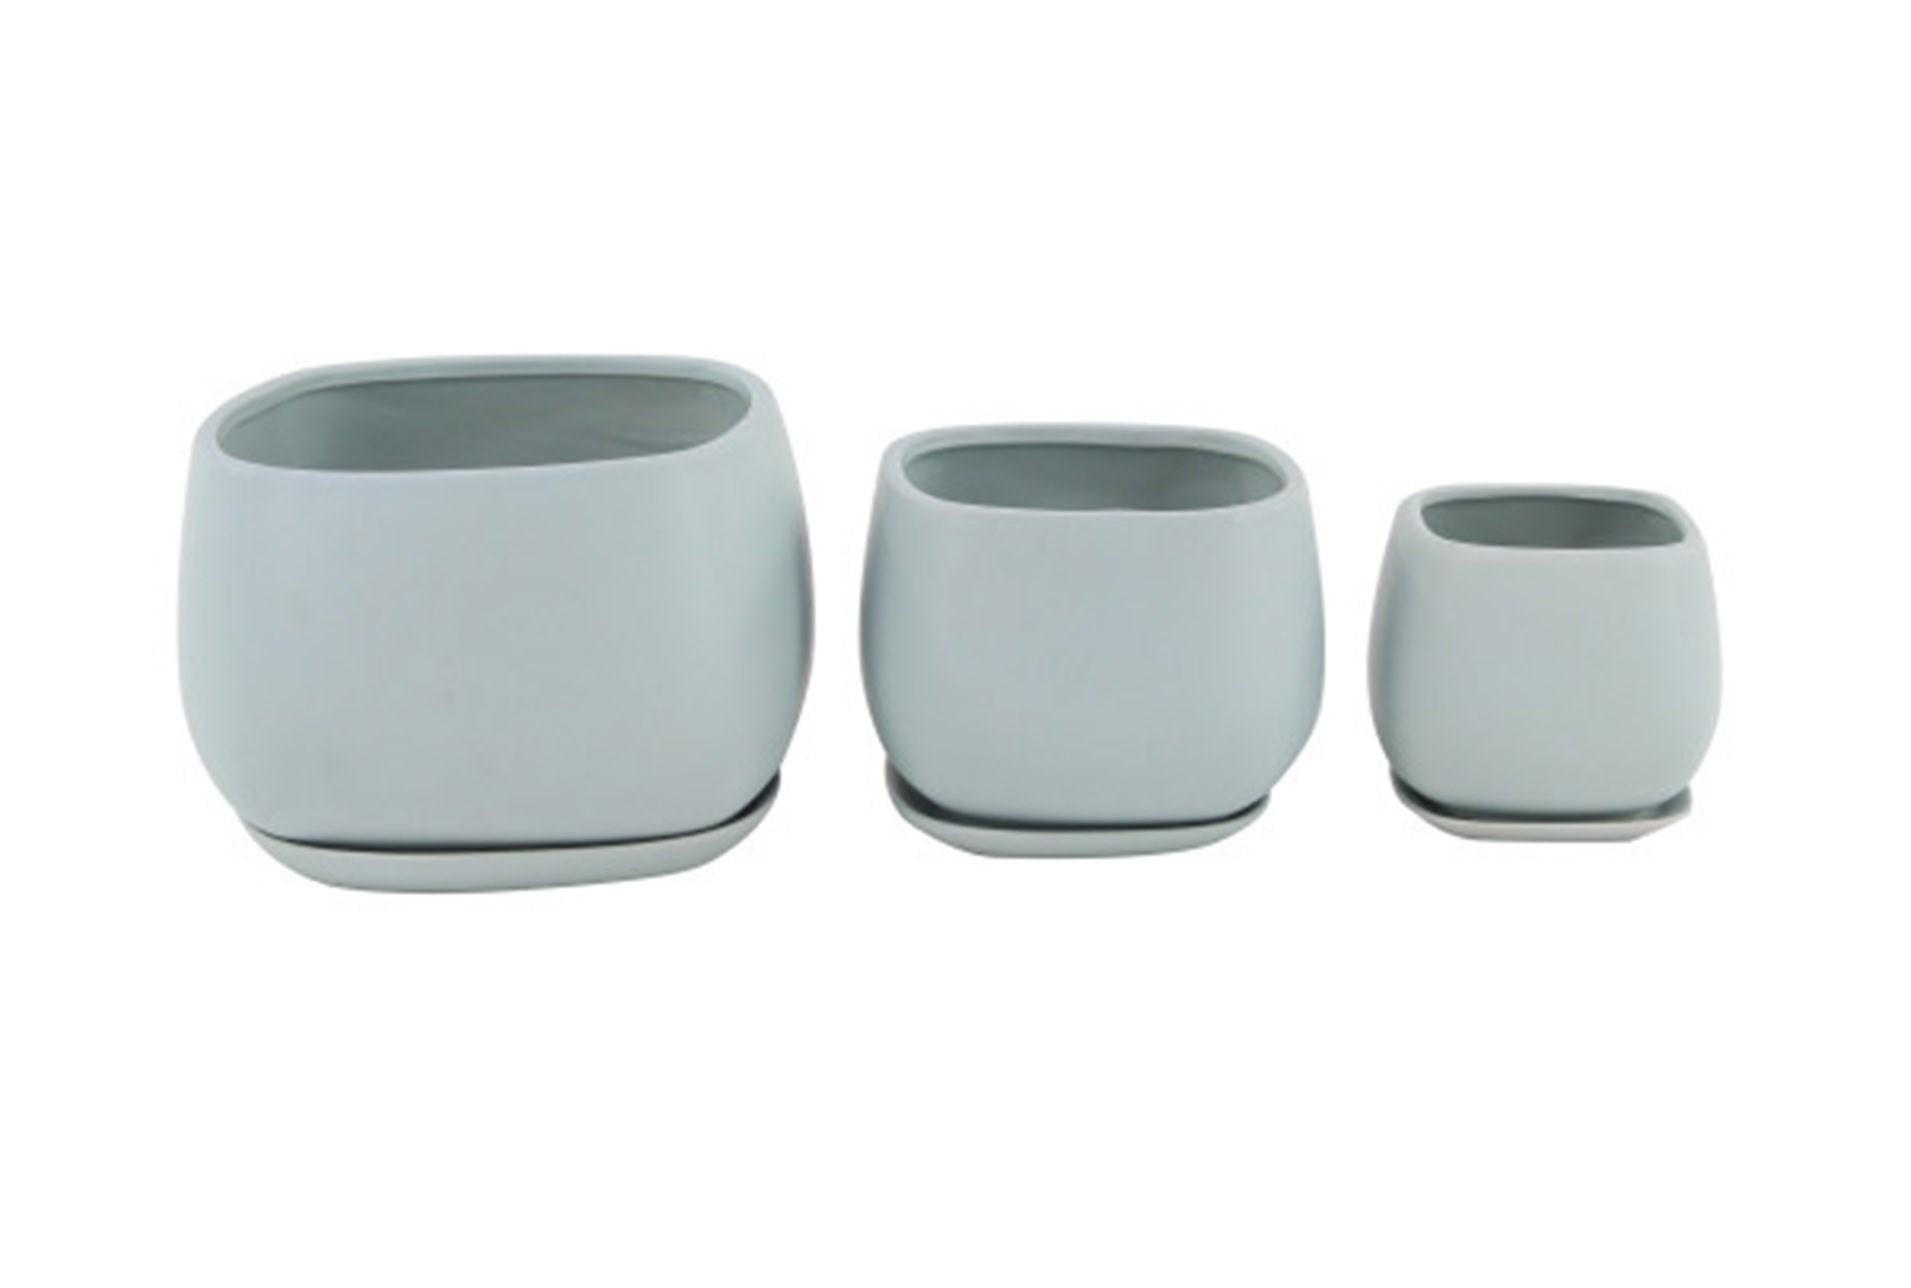 Set Of 3 White Round Ceramic Planter Living Spaces